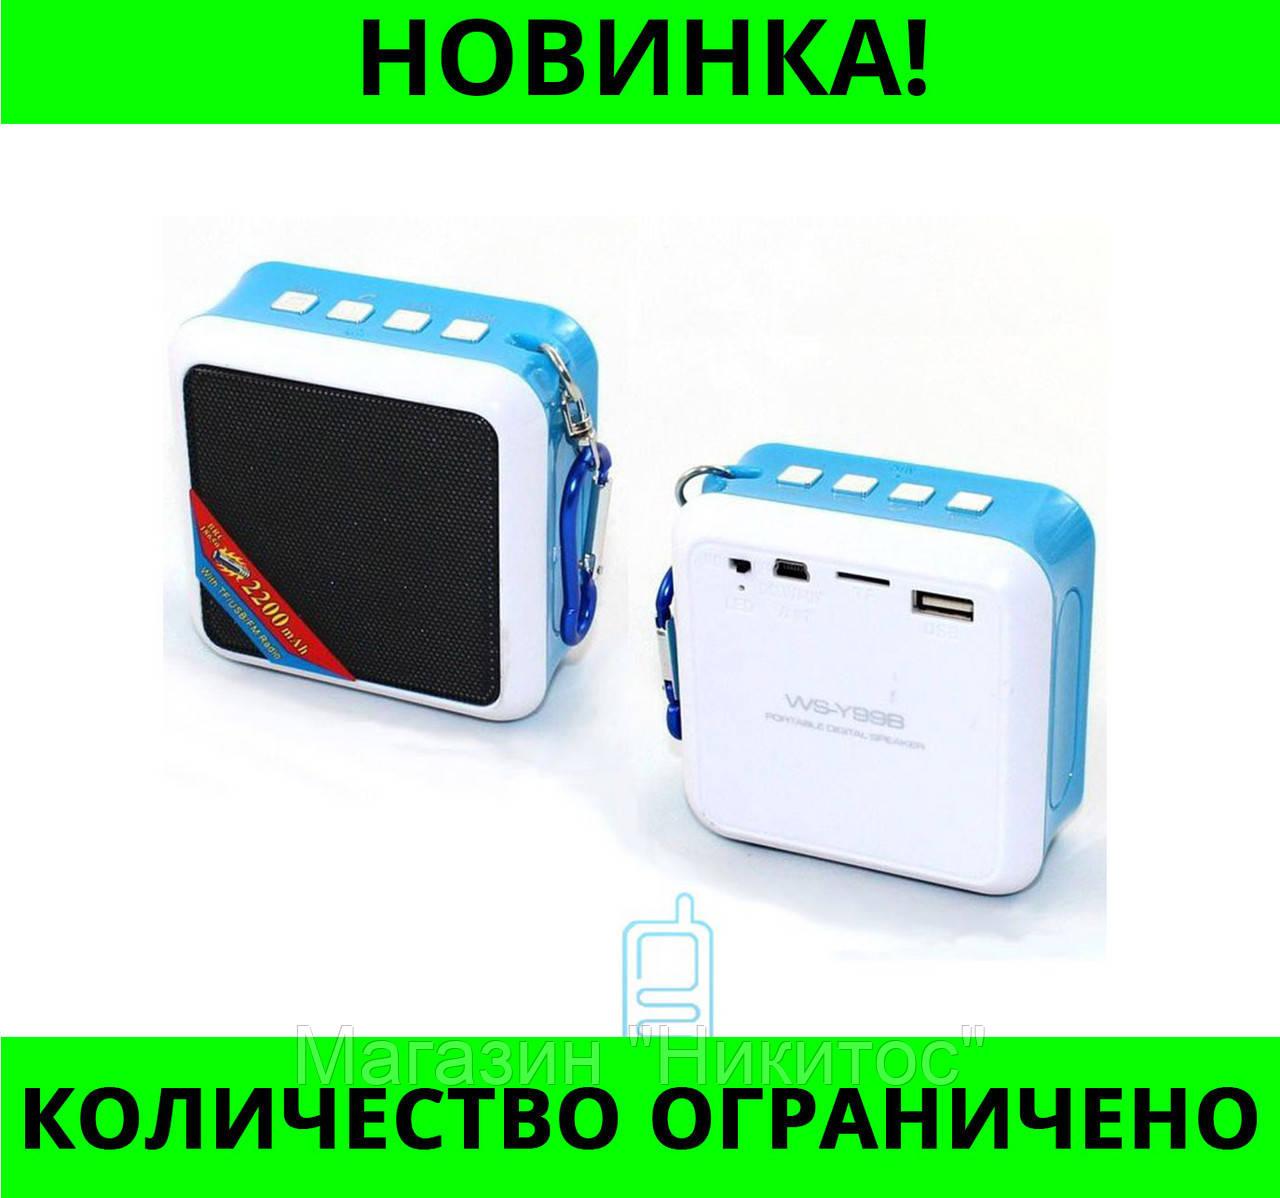 Портативная колонка Bluetooth WSTER WS-Y99B USB, micro SD, FM!Розница и Опт